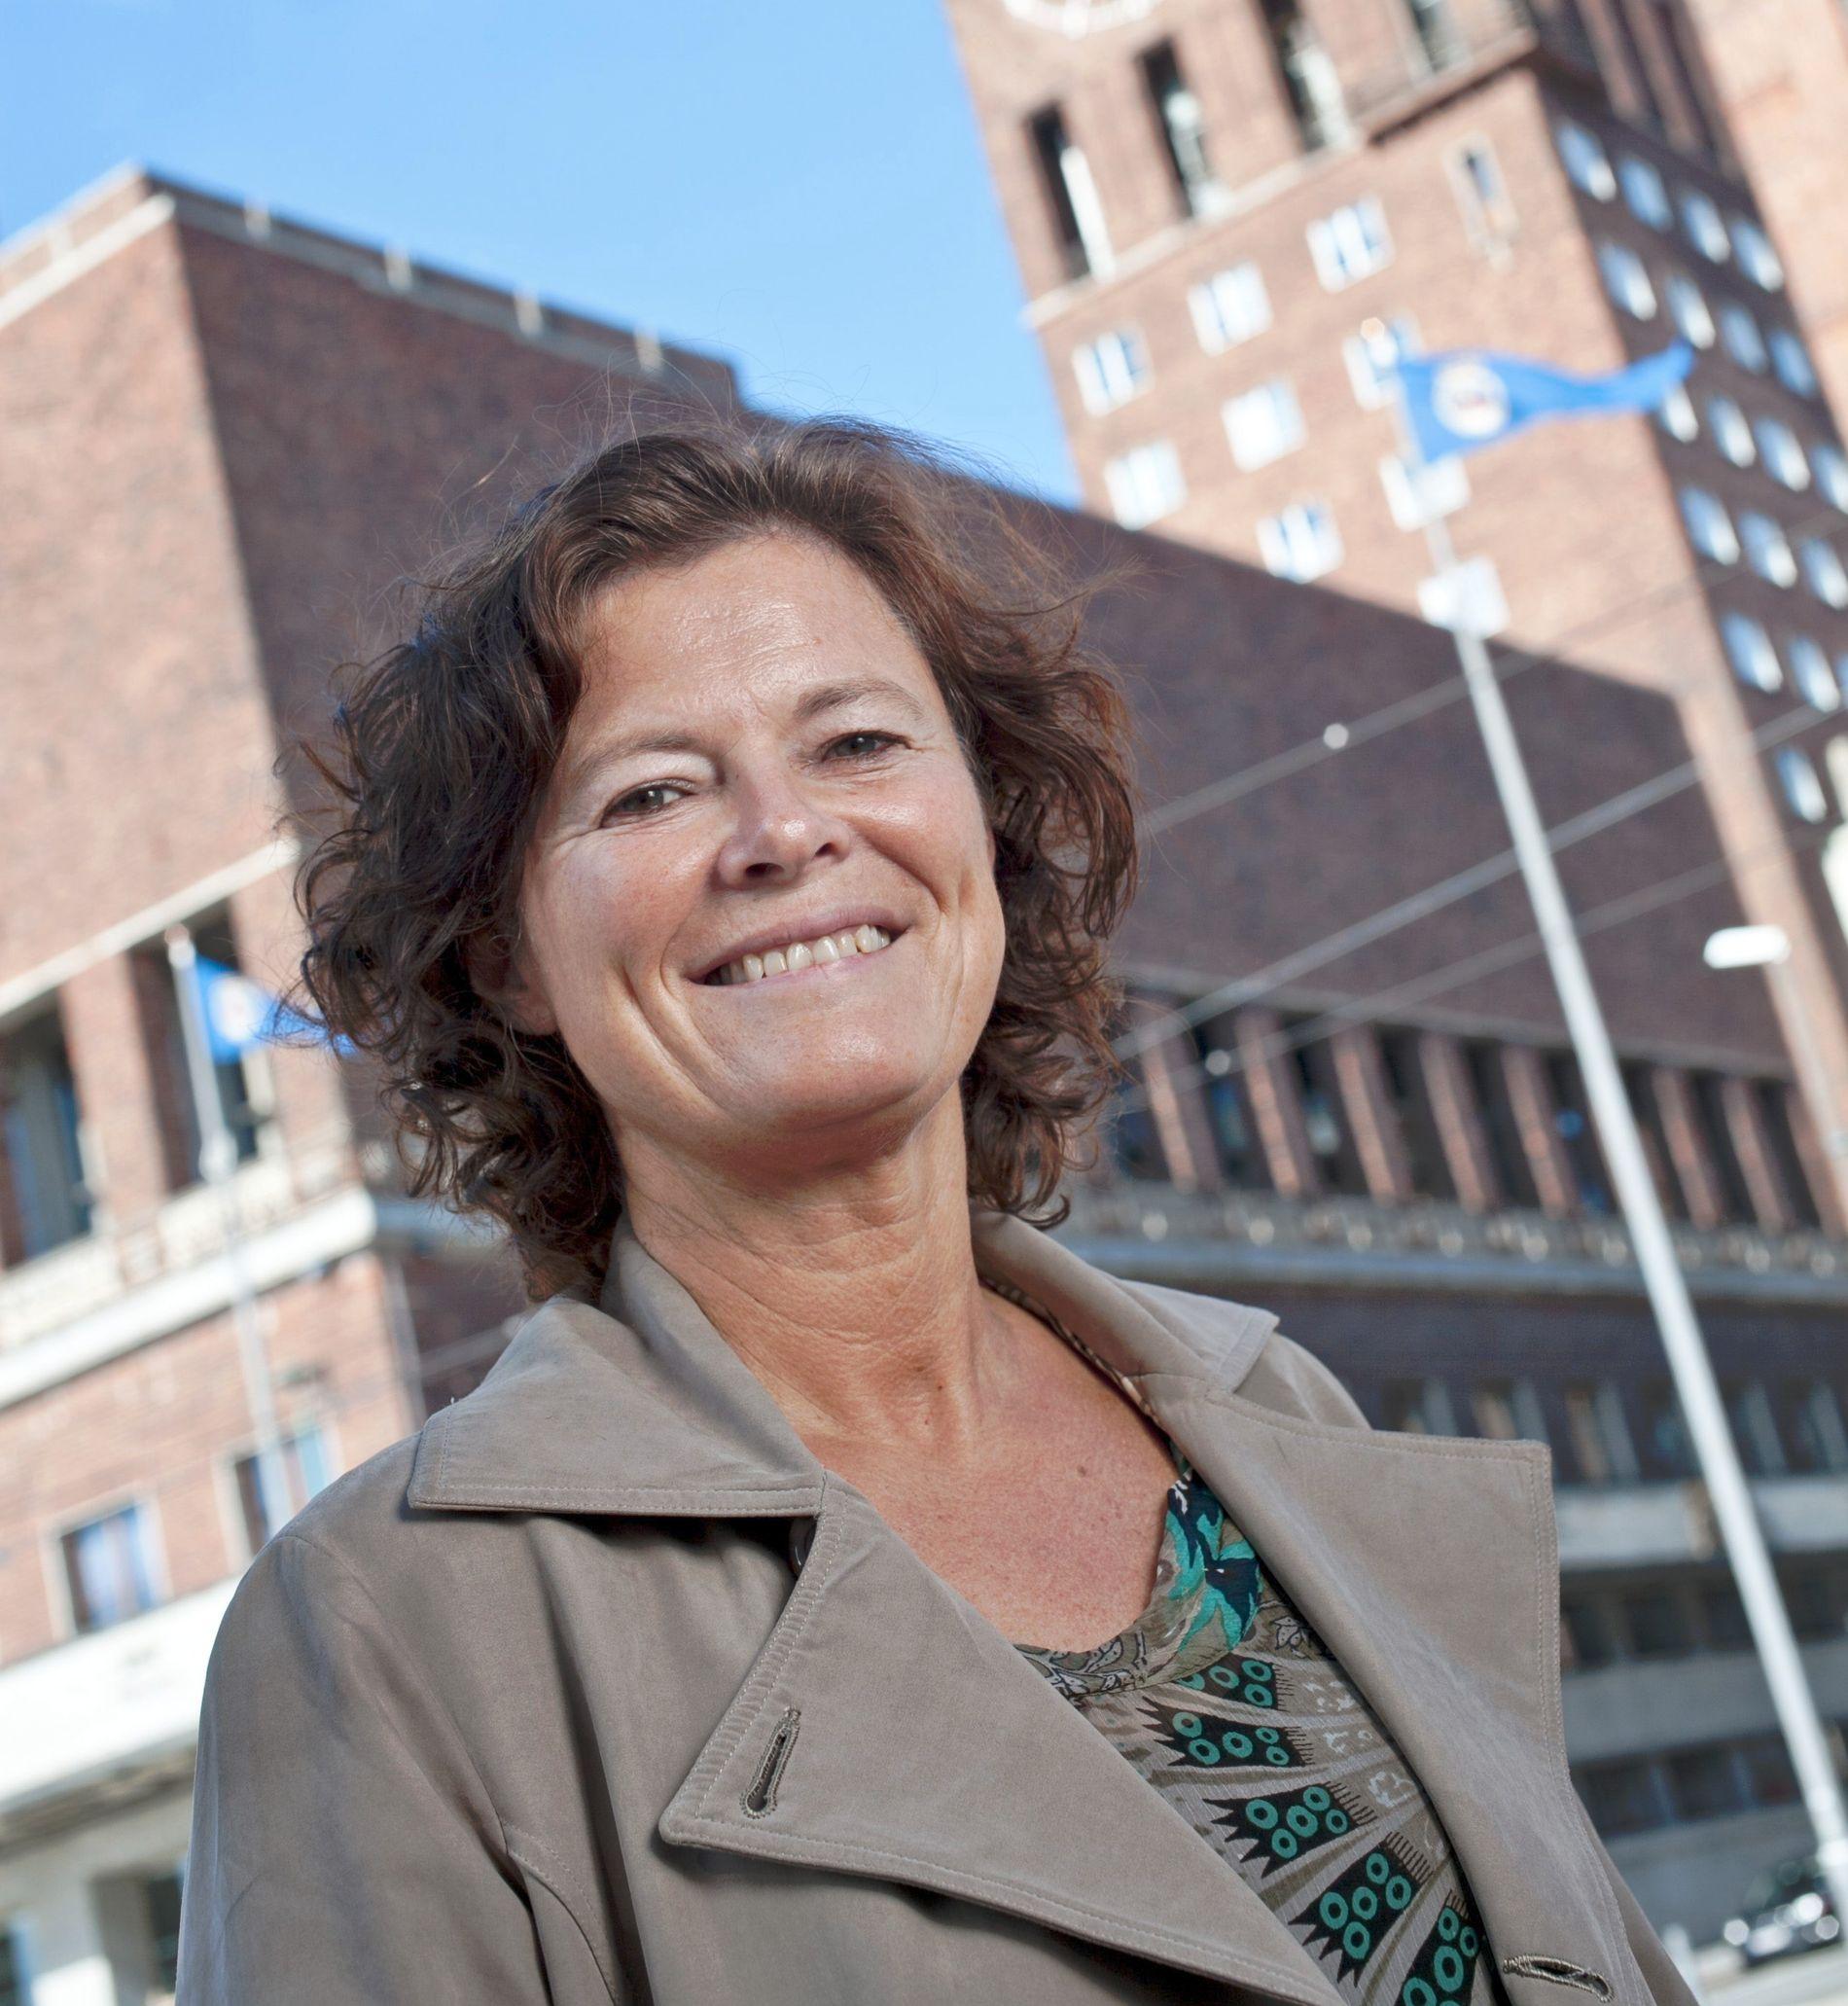 KOMMUNALDIREKTØR: Bente Fagerli er skolesjef Astrid Søgnens sjef.